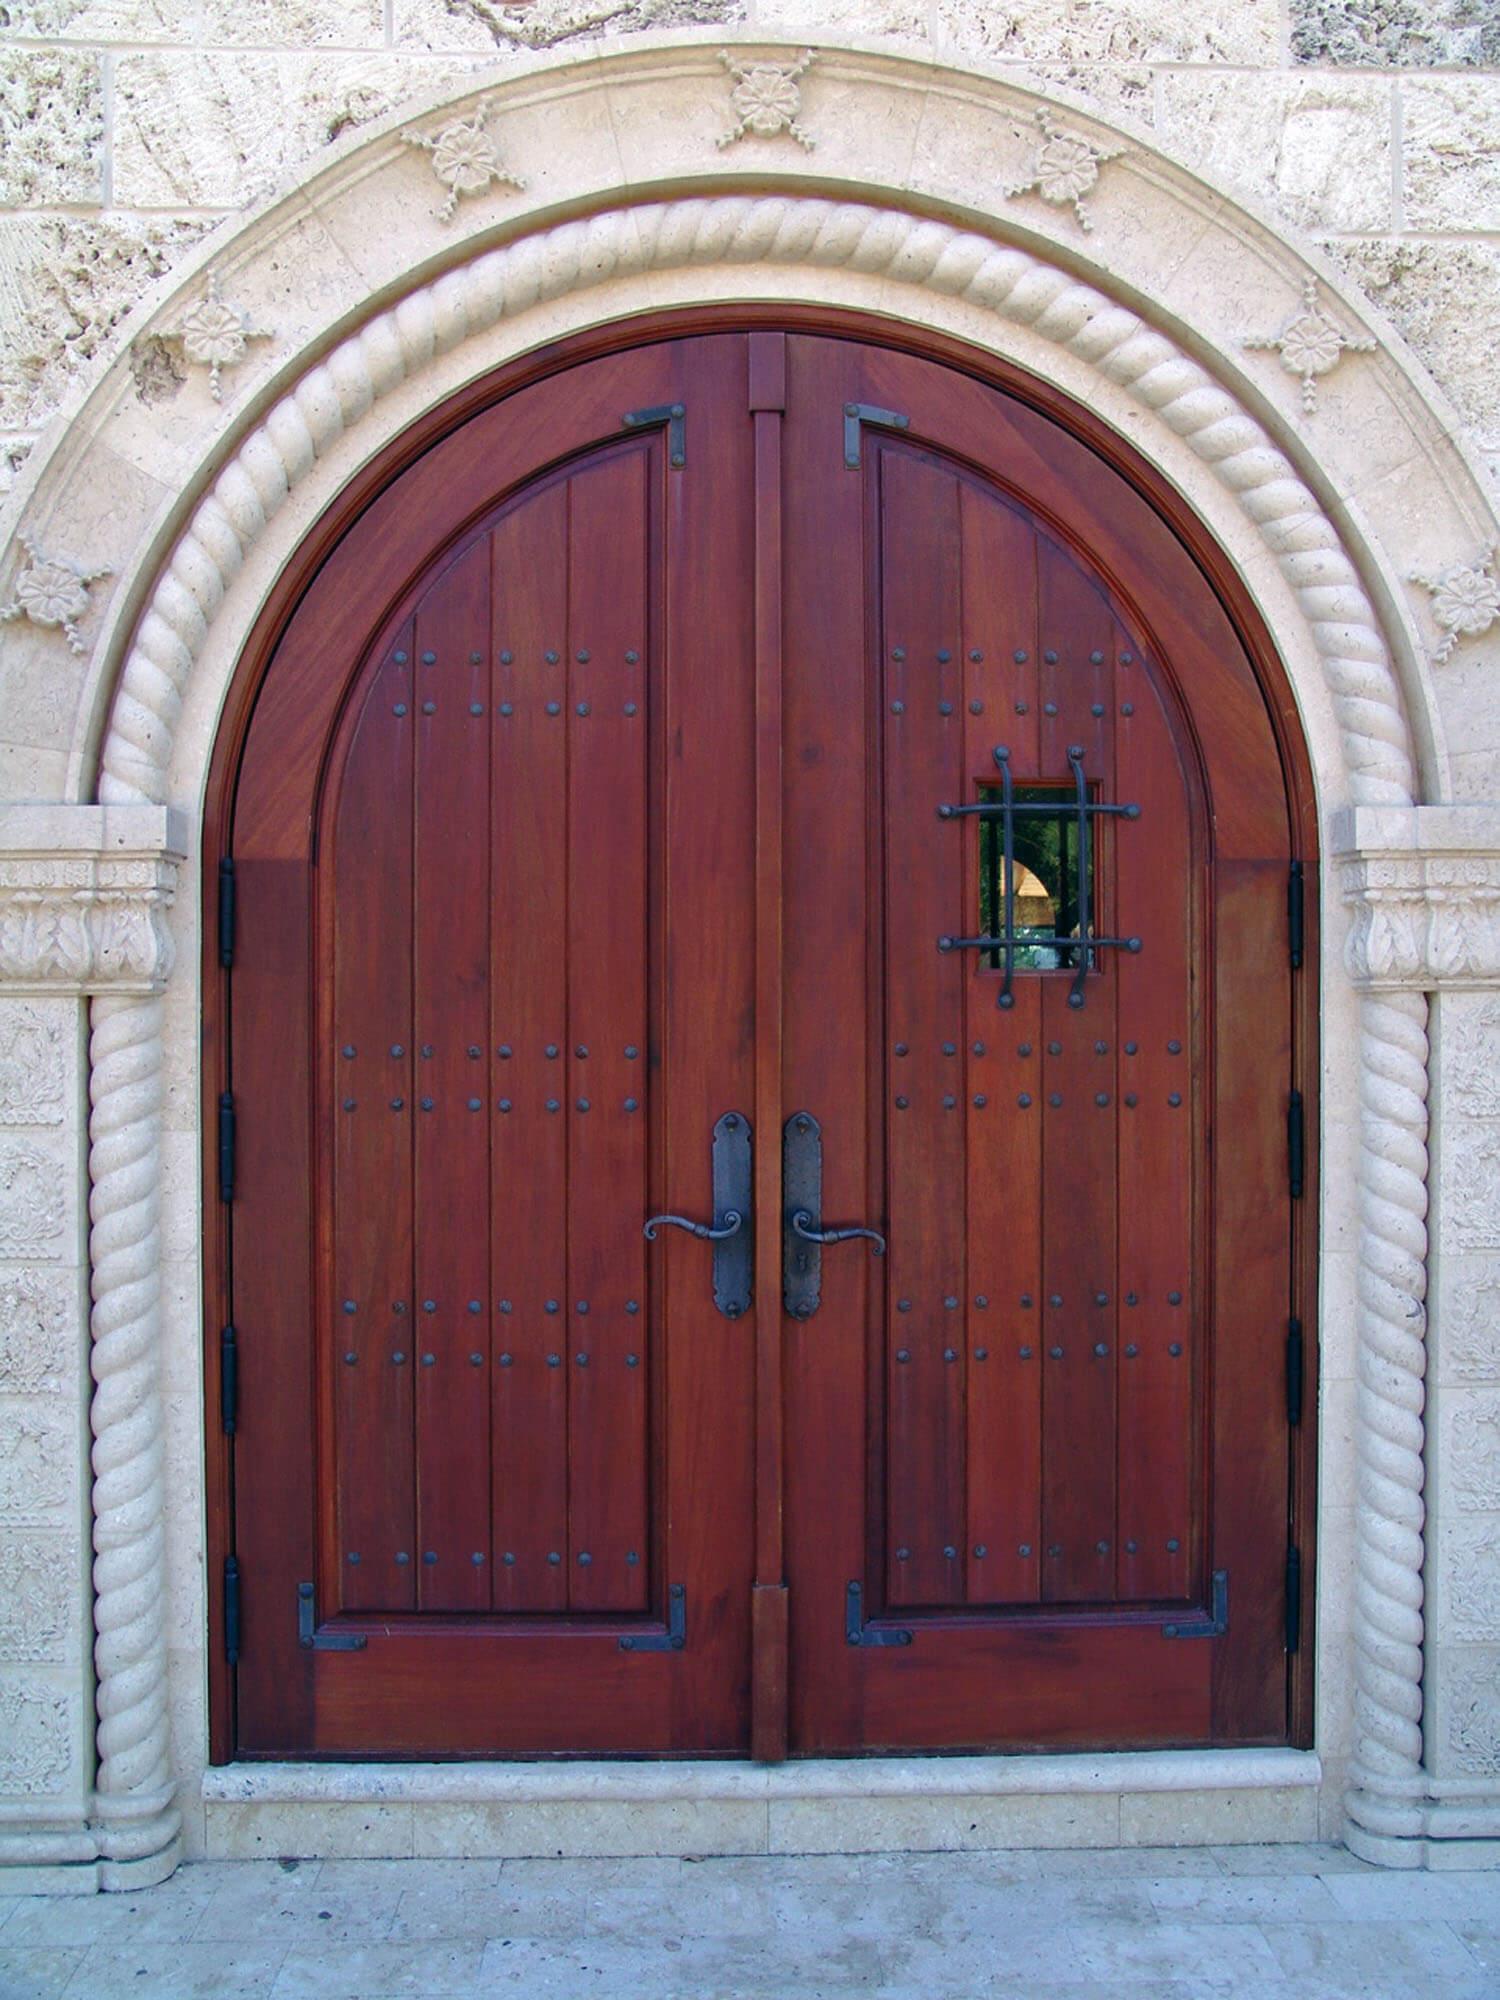 MERRIT ISLAND MAHOGANY ENTRY DOORS.